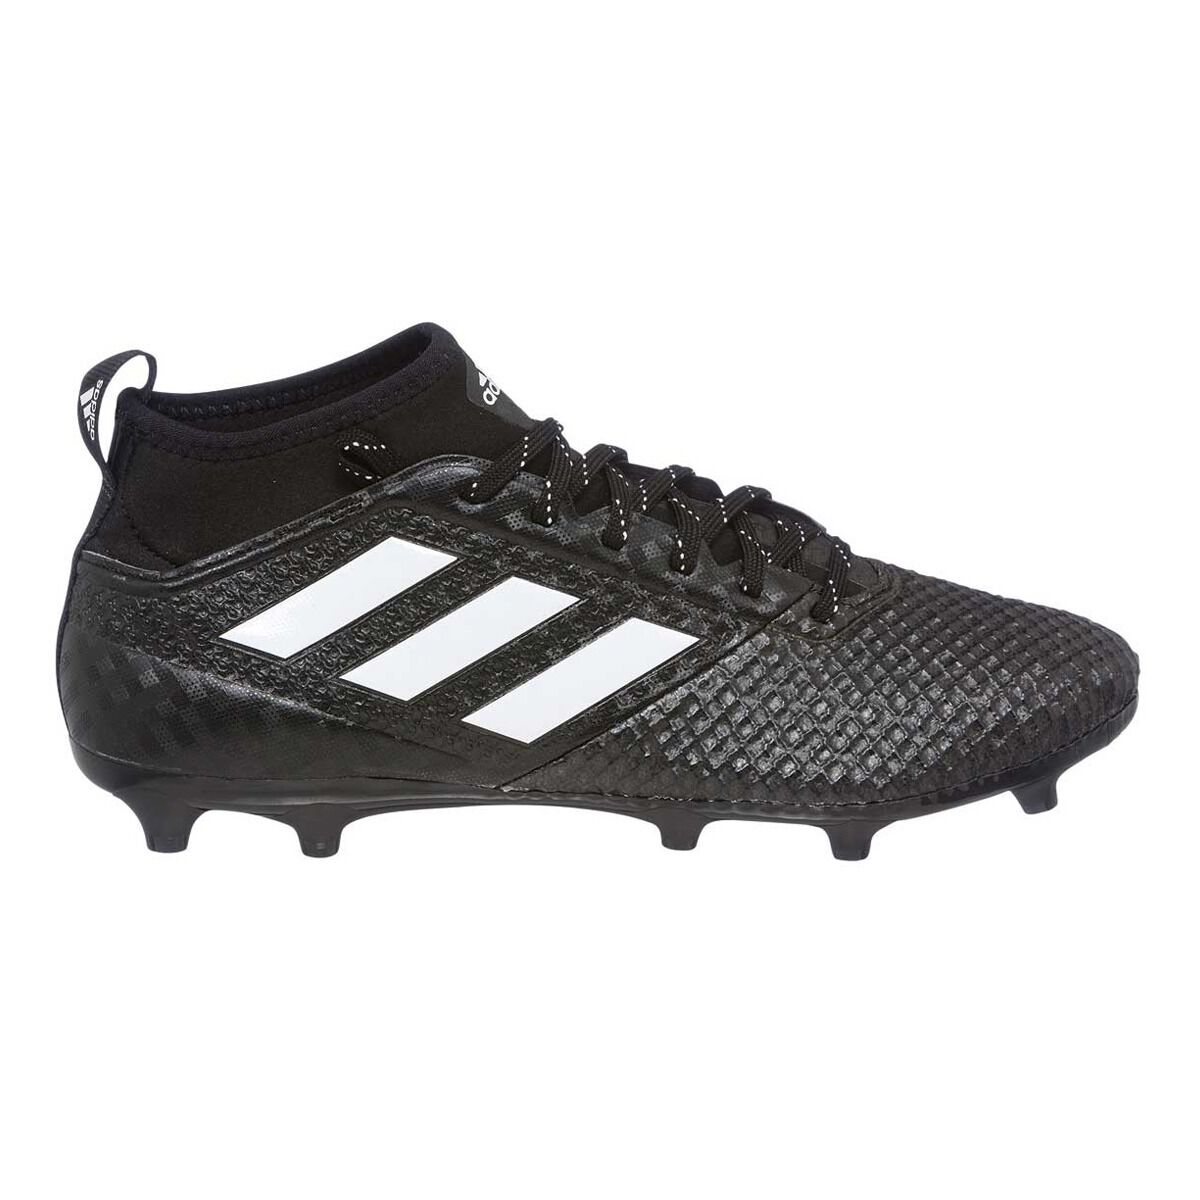 a89eb88b6e1a ... coupon adidas ace 17.3 primemesh mens football boots black white us 8  adult black 69834 e2ae5